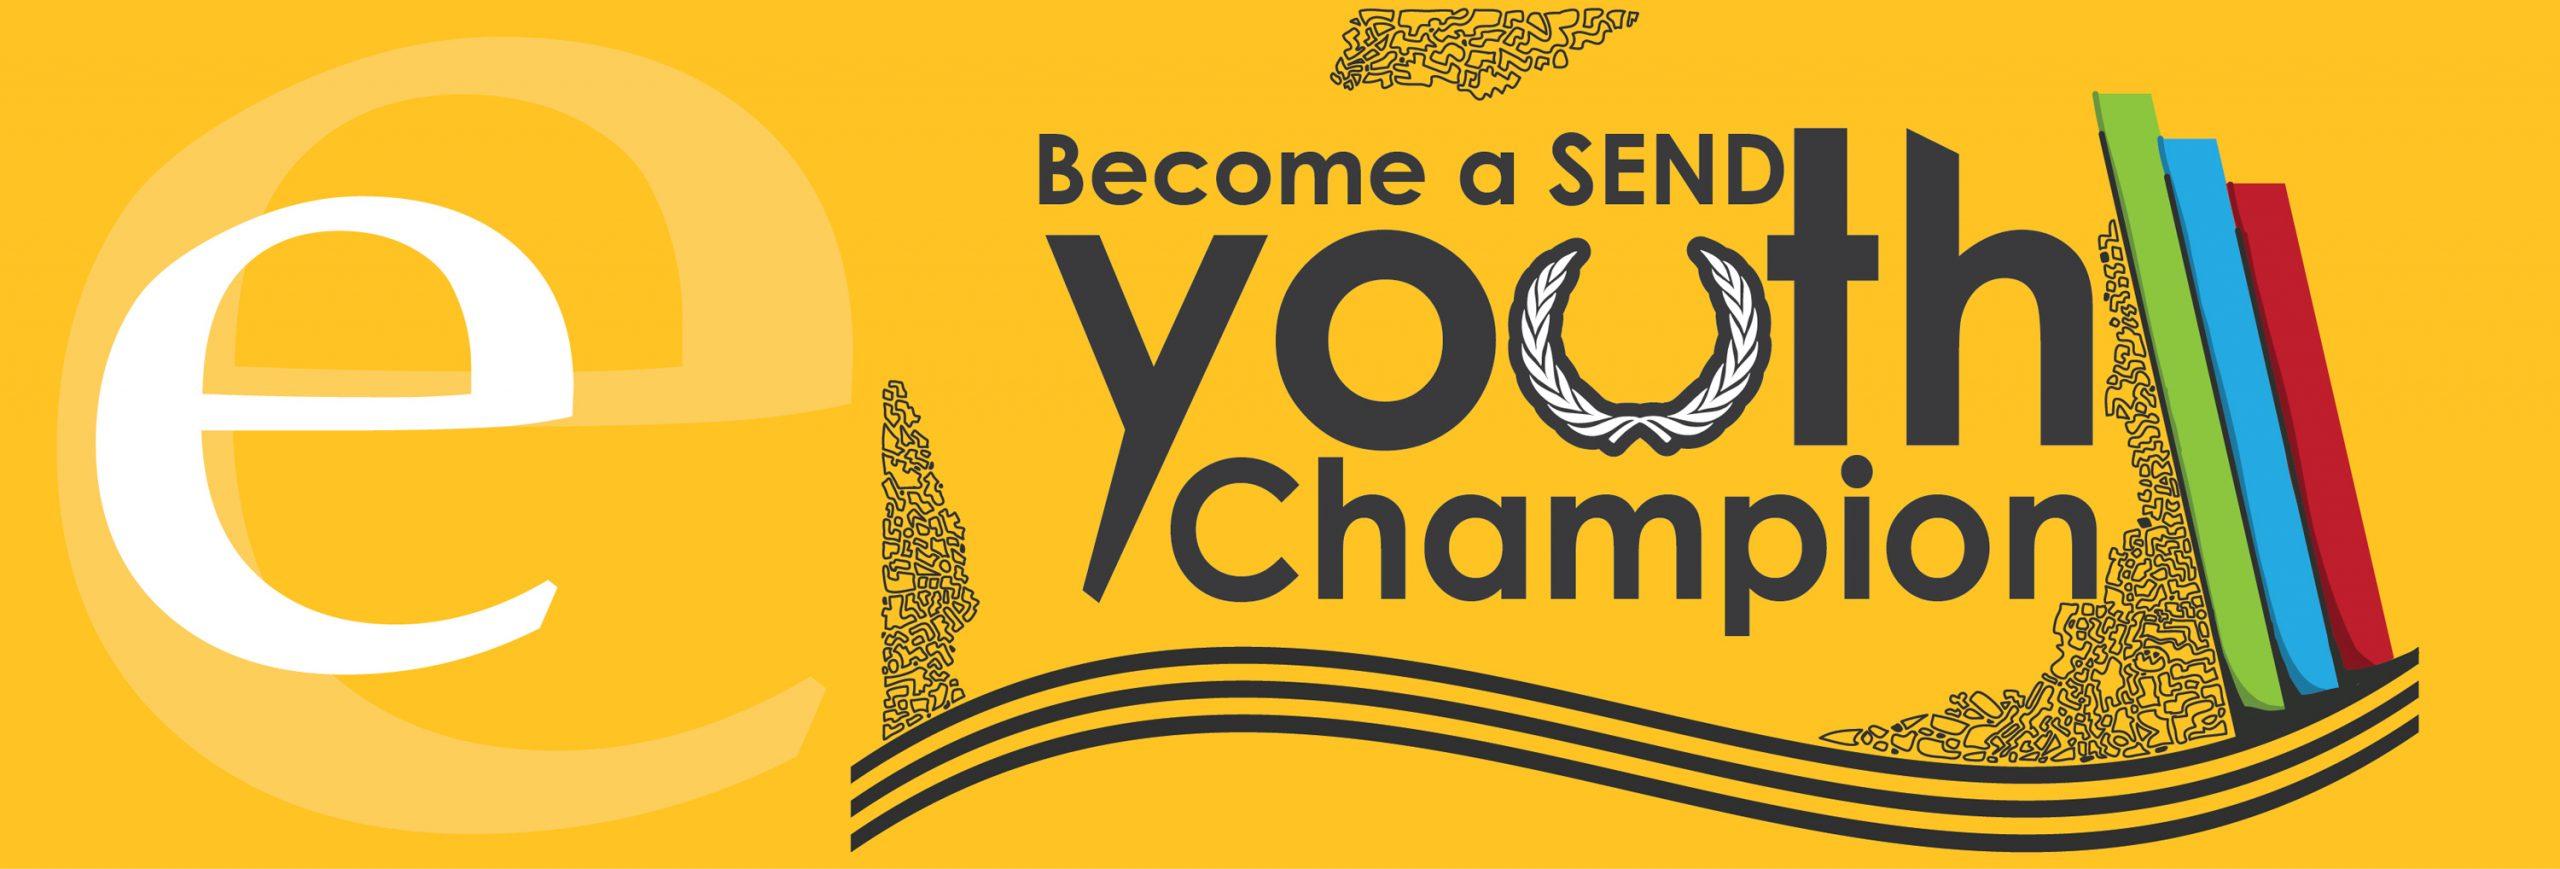 send youth champion